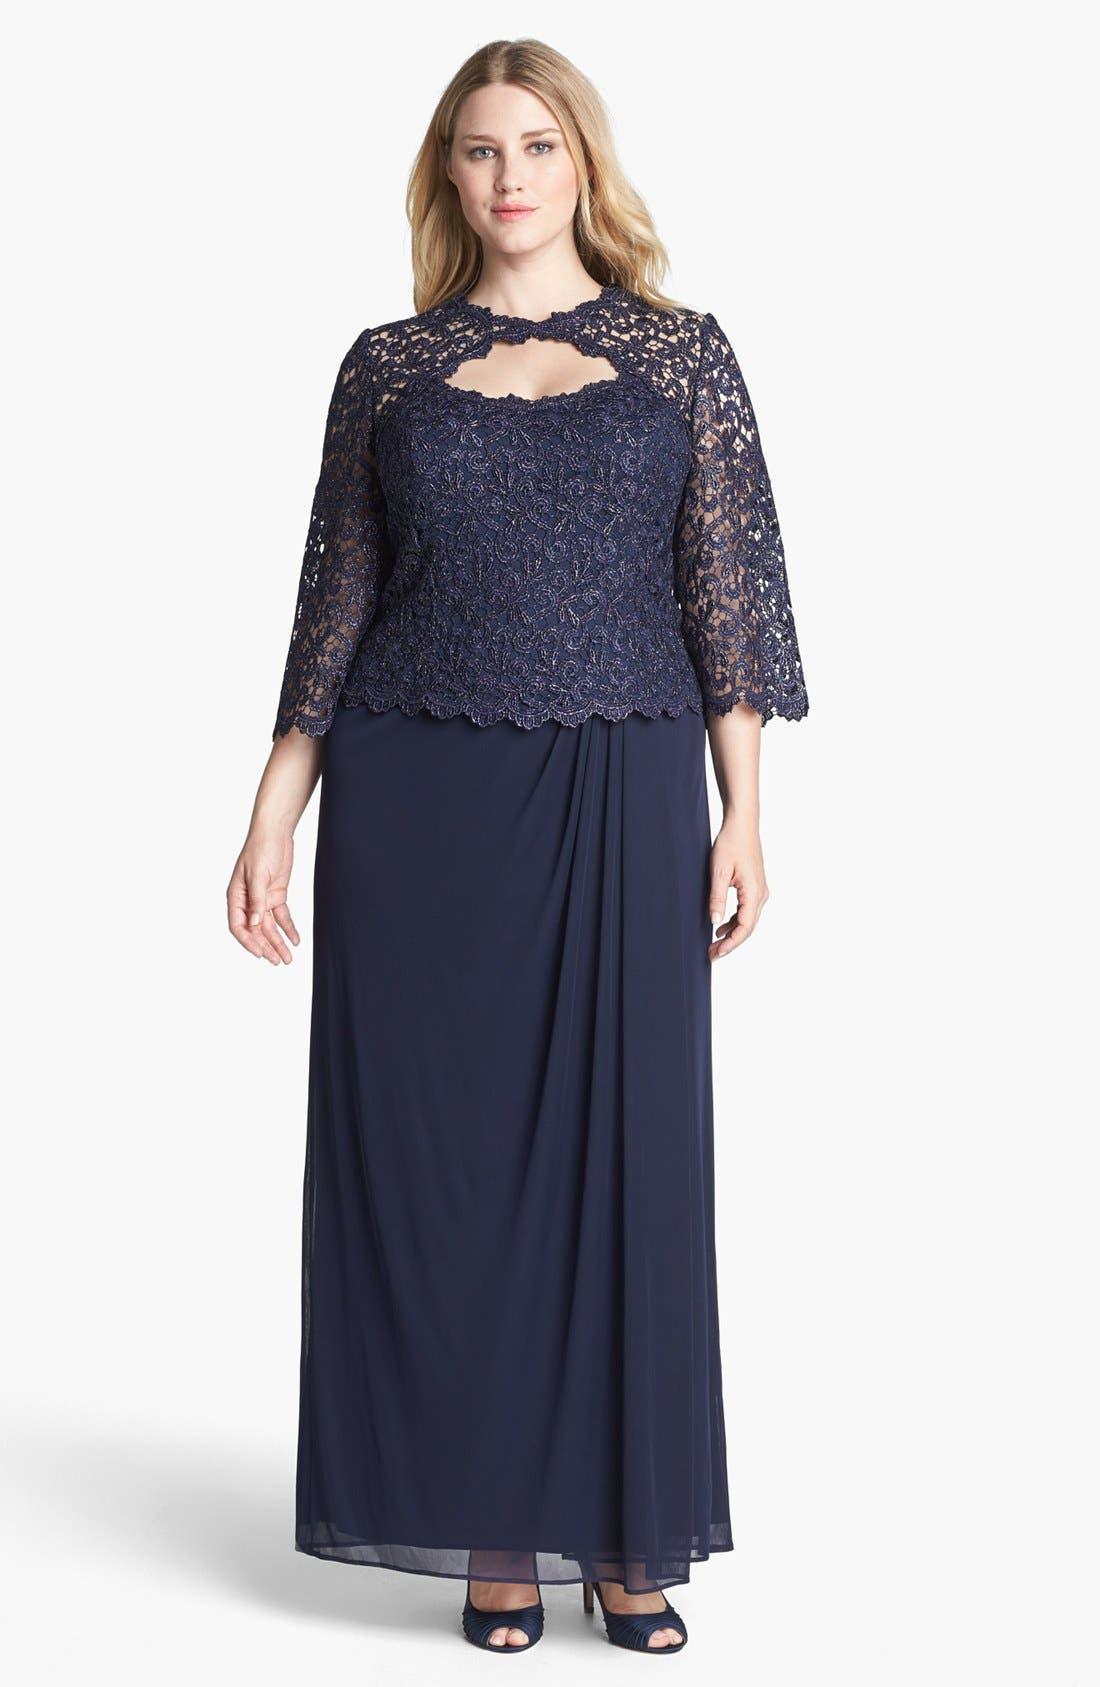 Alternate Image 1 Selected - Alex Evenings Metallic Lace & Mesh Gown (Plus Size)